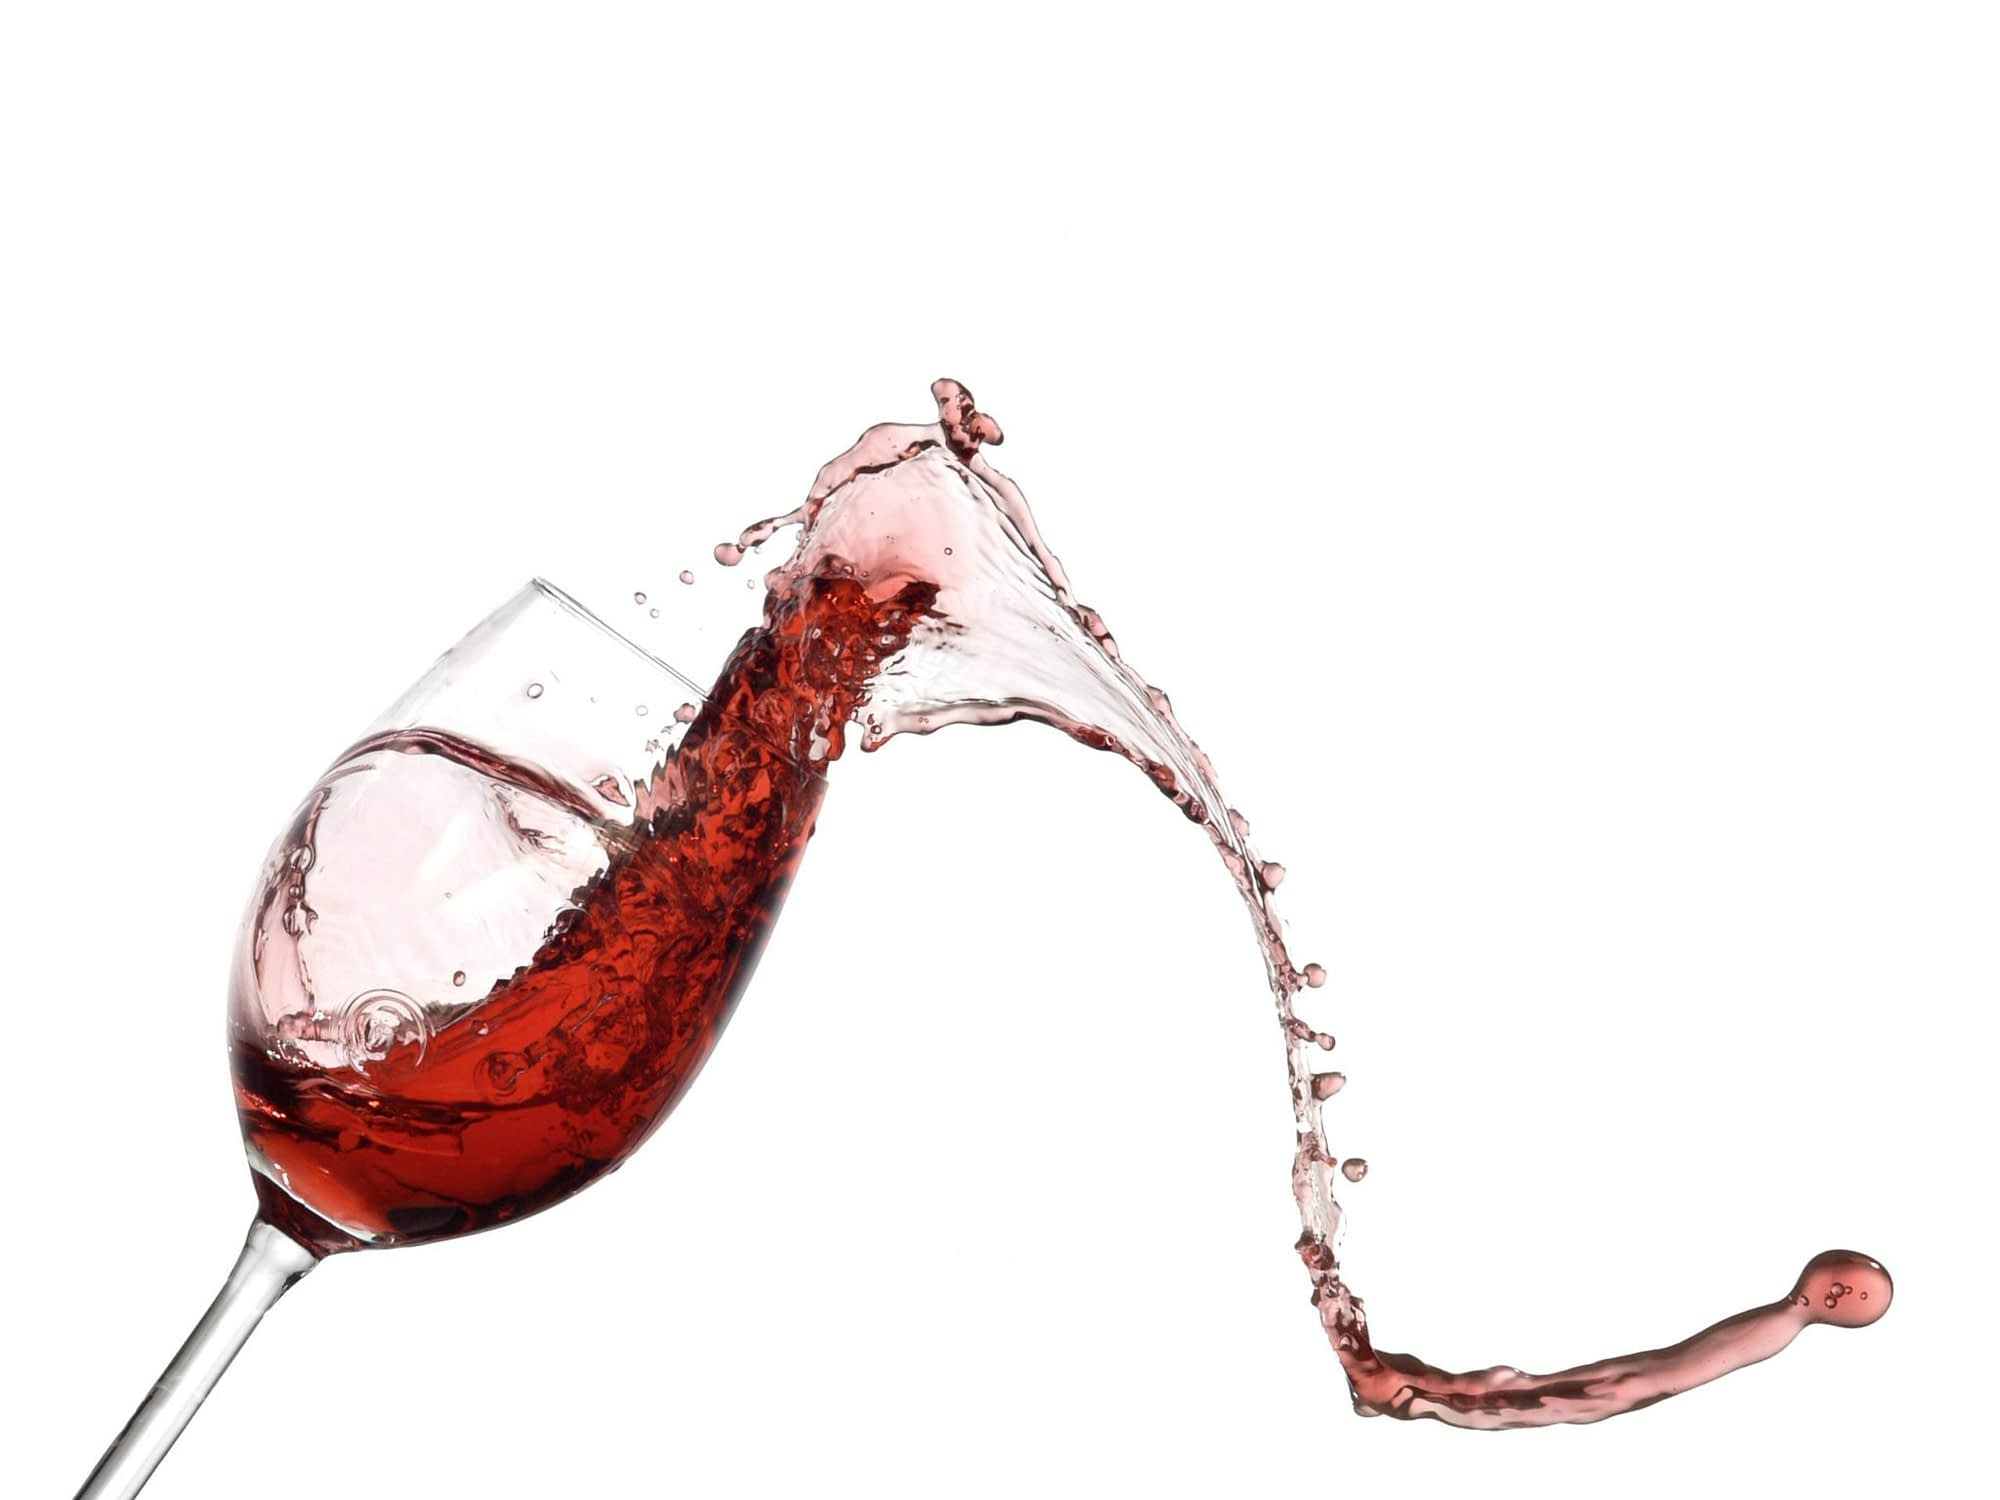 red wine spilling on a carpet